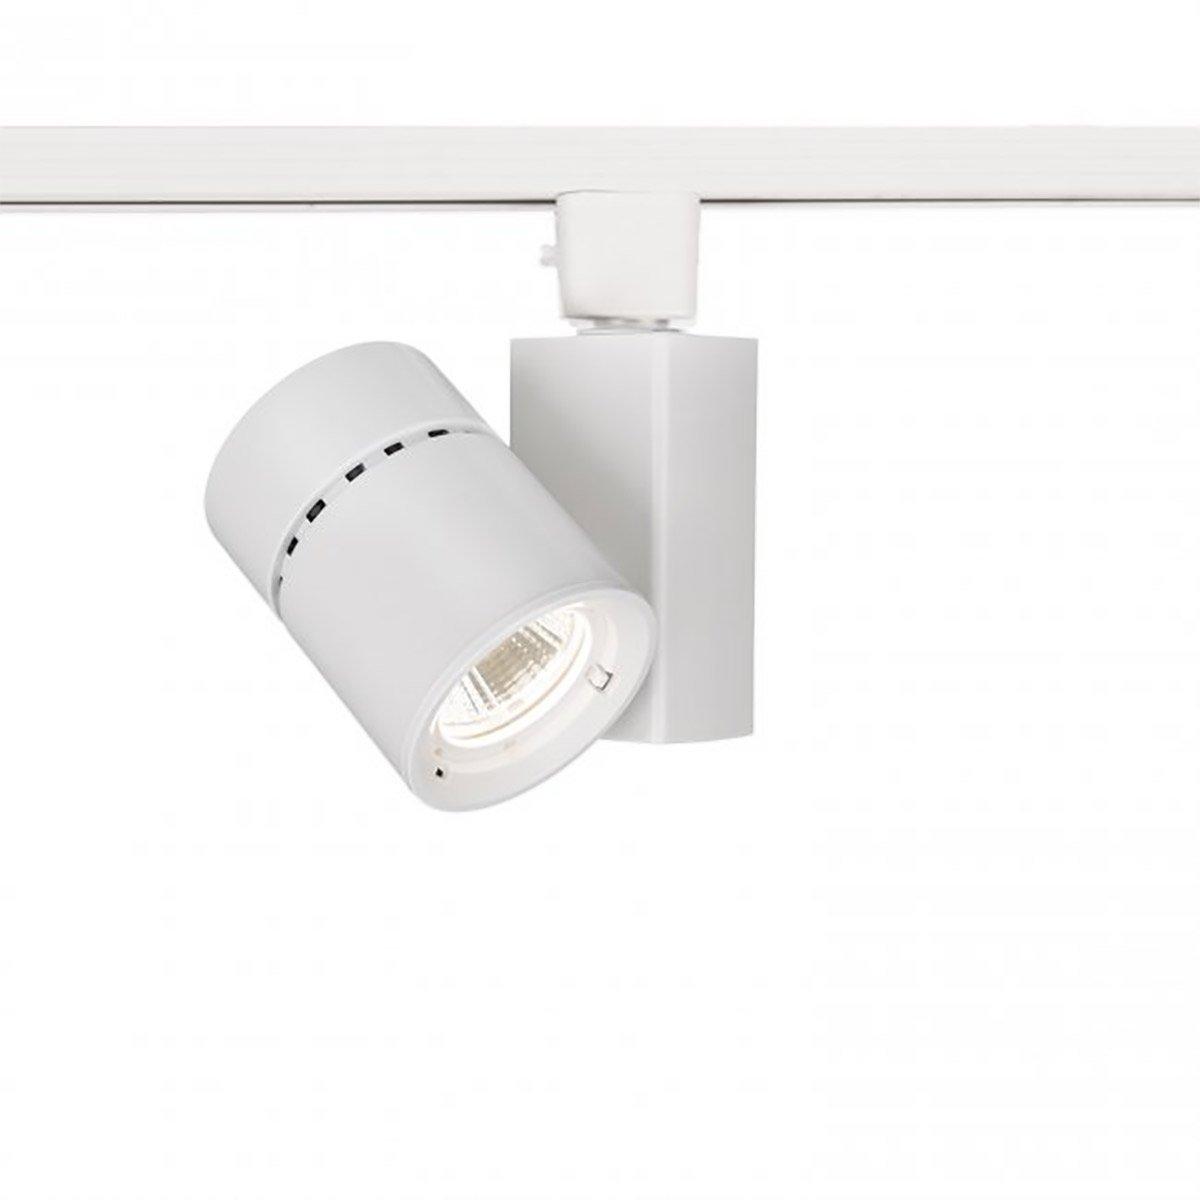 WAC Lighting H-1023N-930-WT H Series LED1023 Exterminator II LED Energy Star Track Head in White Finish, Narrow Beam, 90+CRI and 3000K